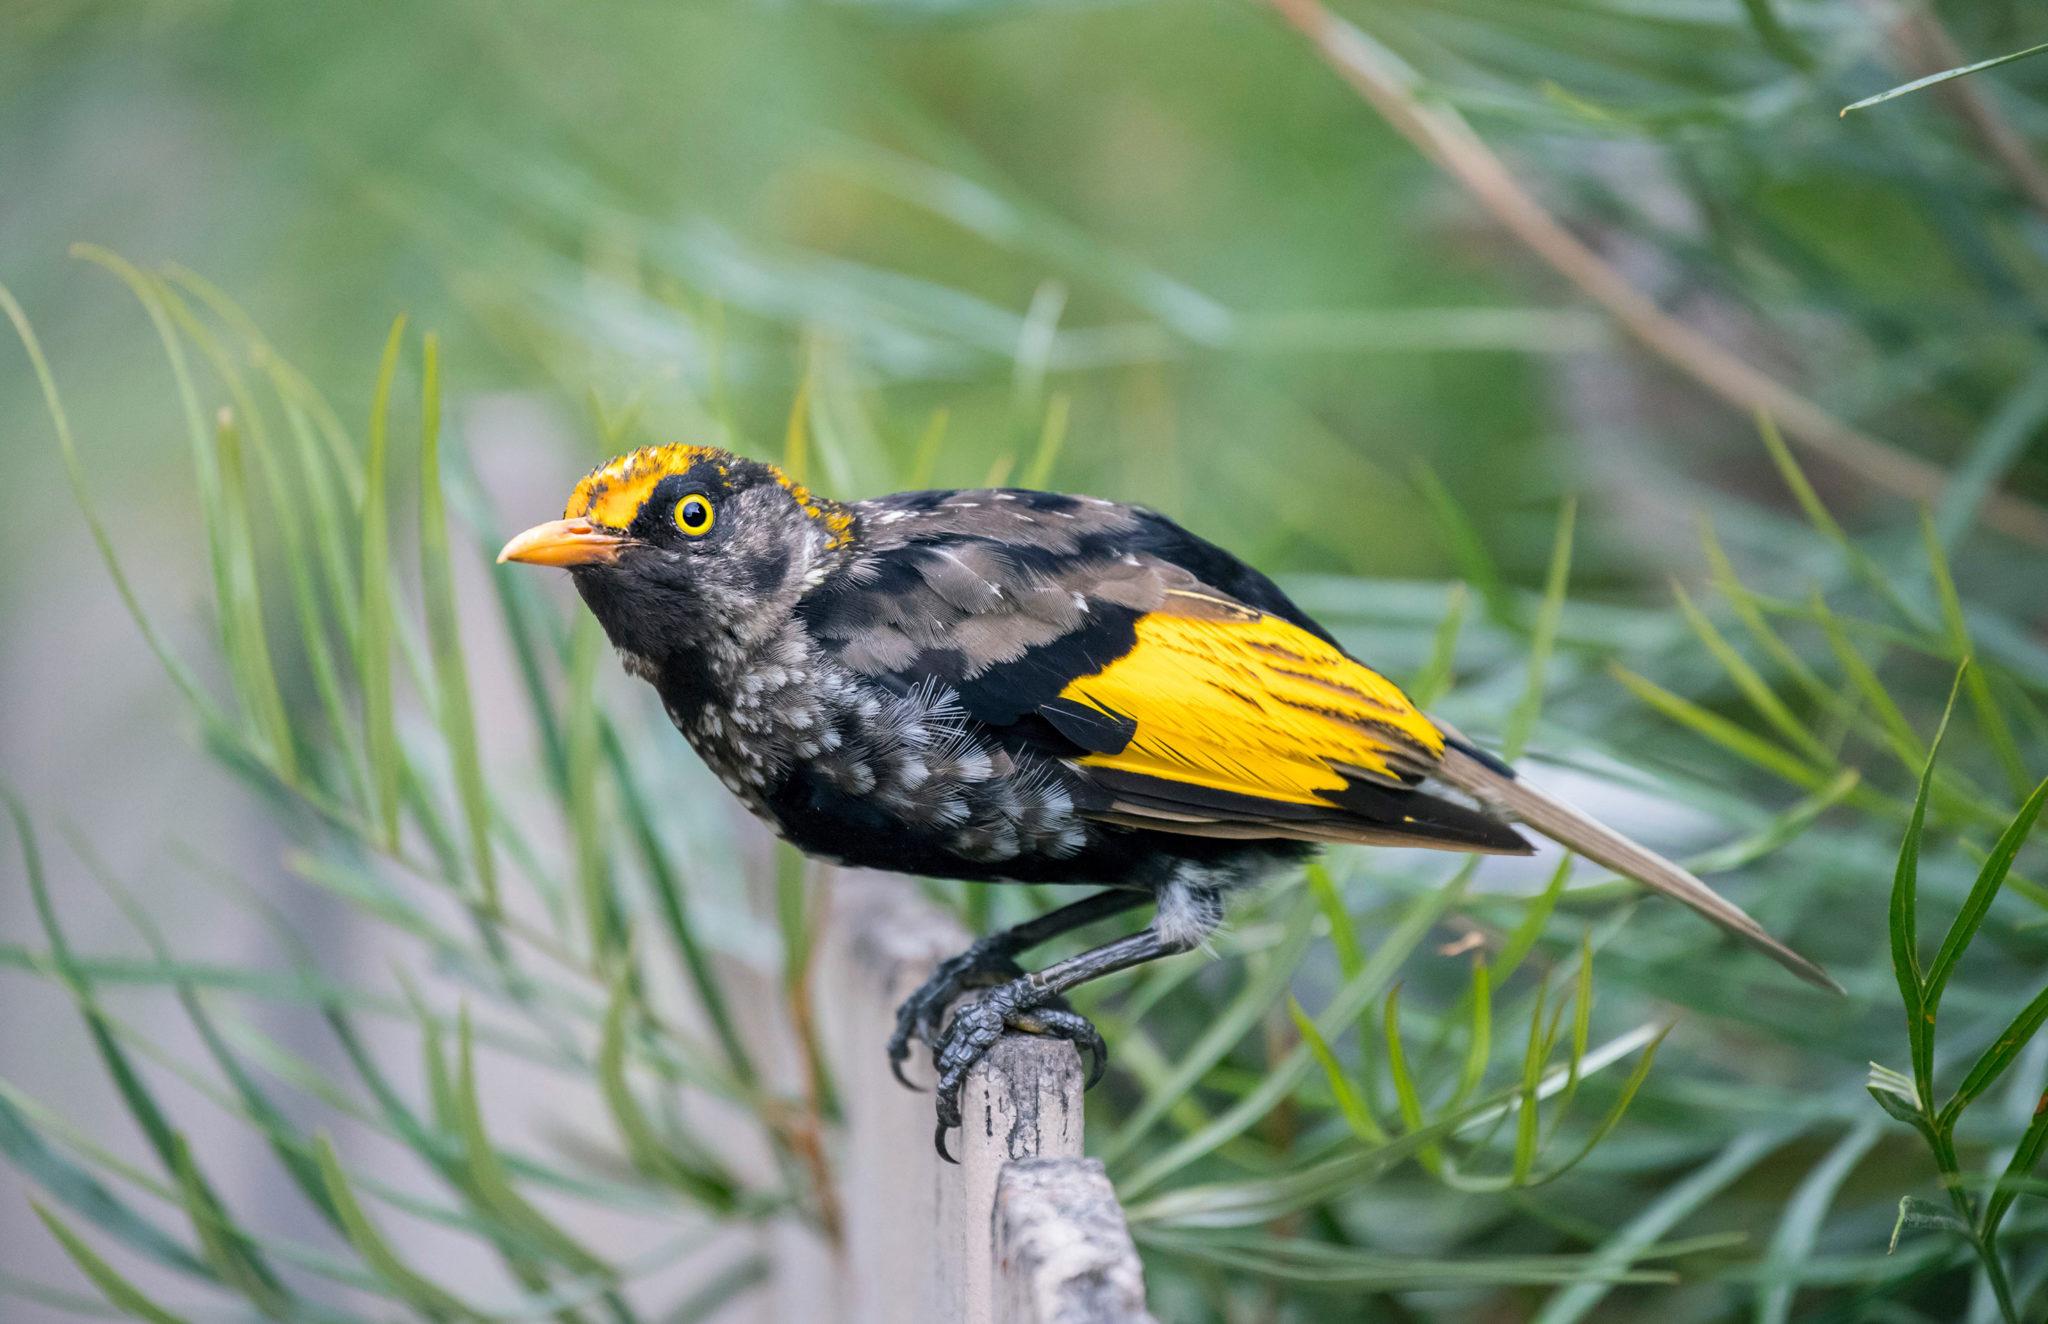 Juvenile Regent Bowerbird